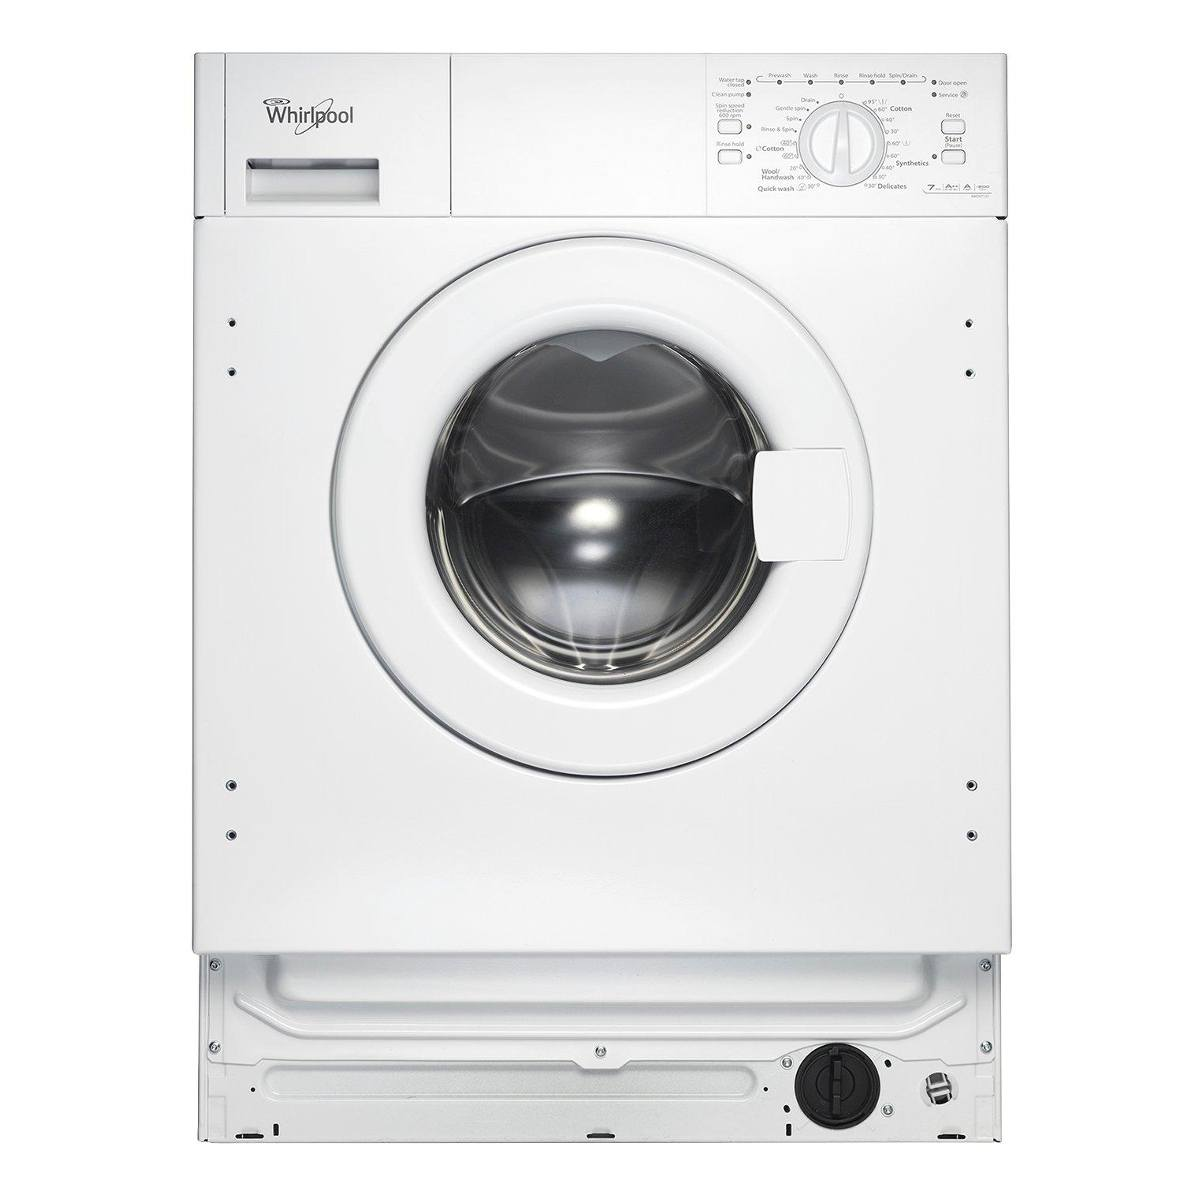 whirlpool awoa7123 7kg built in washing machine white. Black Bedroom Furniture Sets. Home Design Ideas